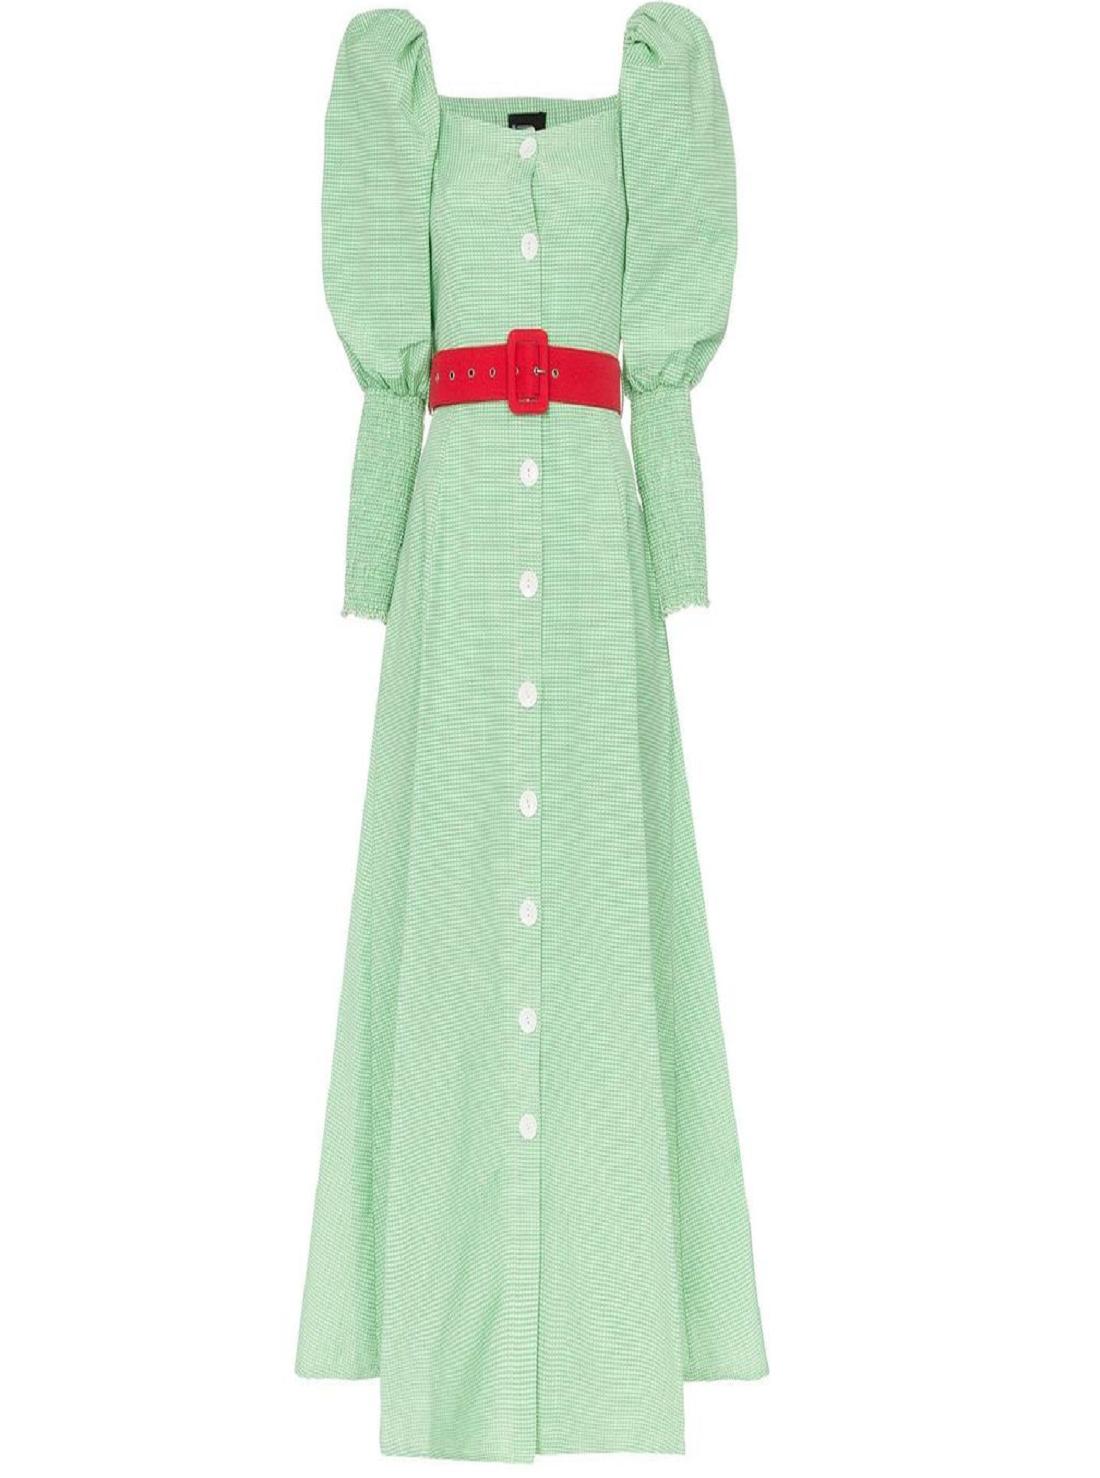 6 Wholesale Puff Long Sleeve Dresses